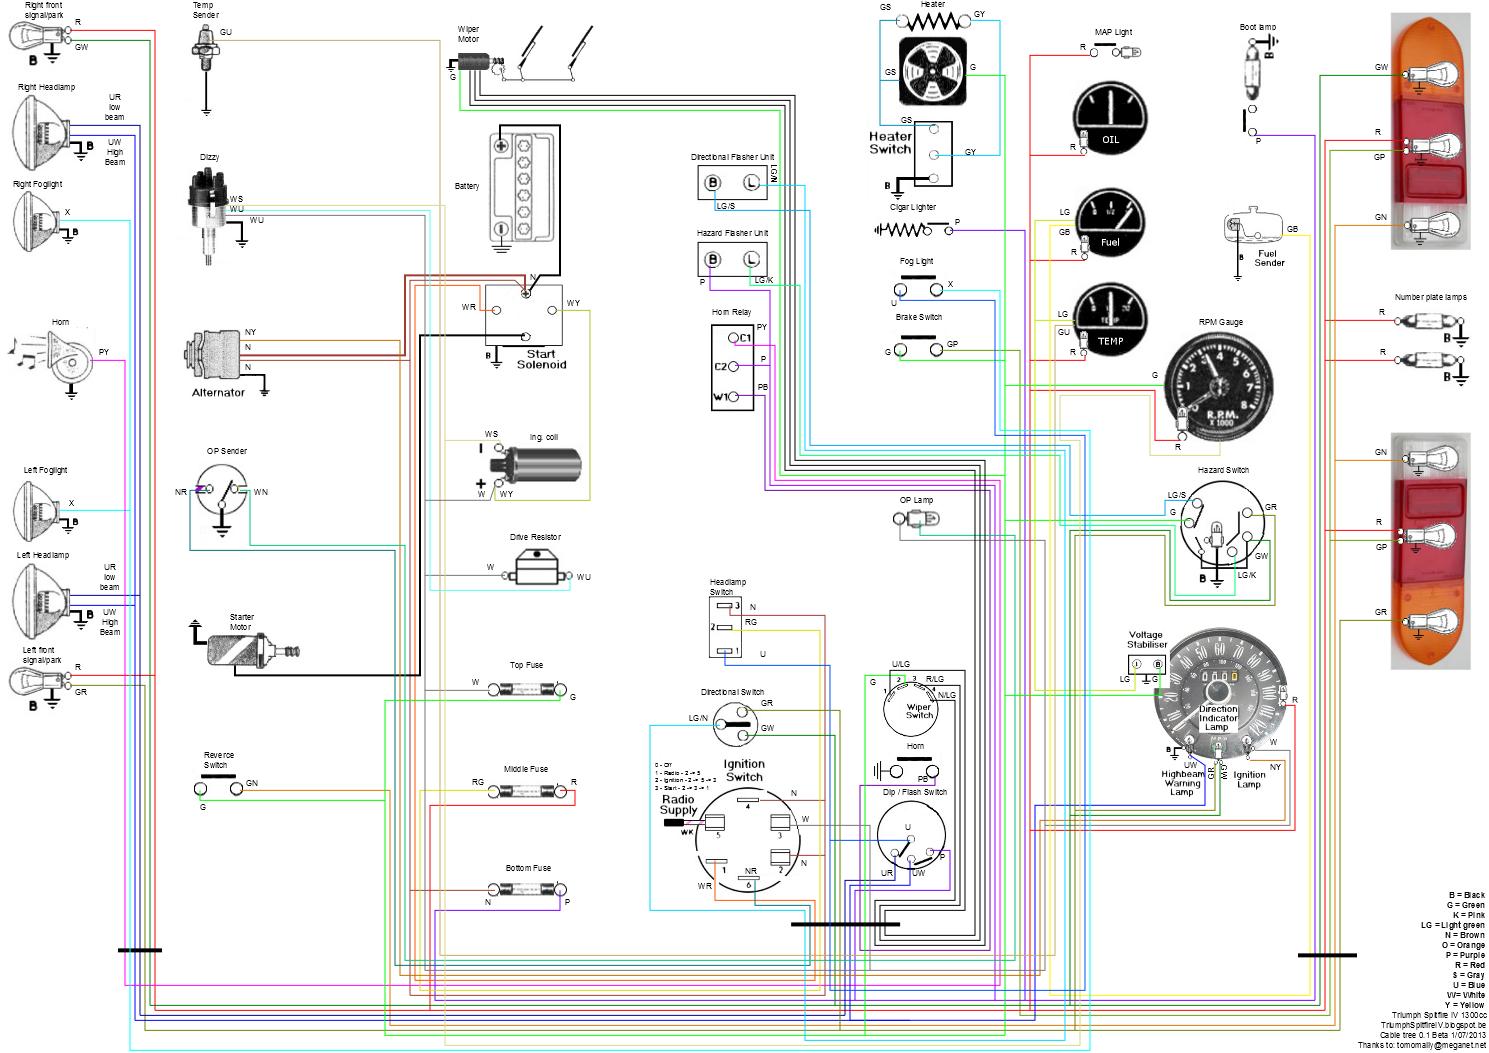 [ZHKZ_3066]  HH_6628] 76 Triumph Spitfire Wiring Diagram Download Diagram | Wiring Schematics And Diagrams Triumph Spitfire Gt6 Herald |  | Epete Bios Xempag Awni Jebrp Mohammedshrine Librar Wiring 101